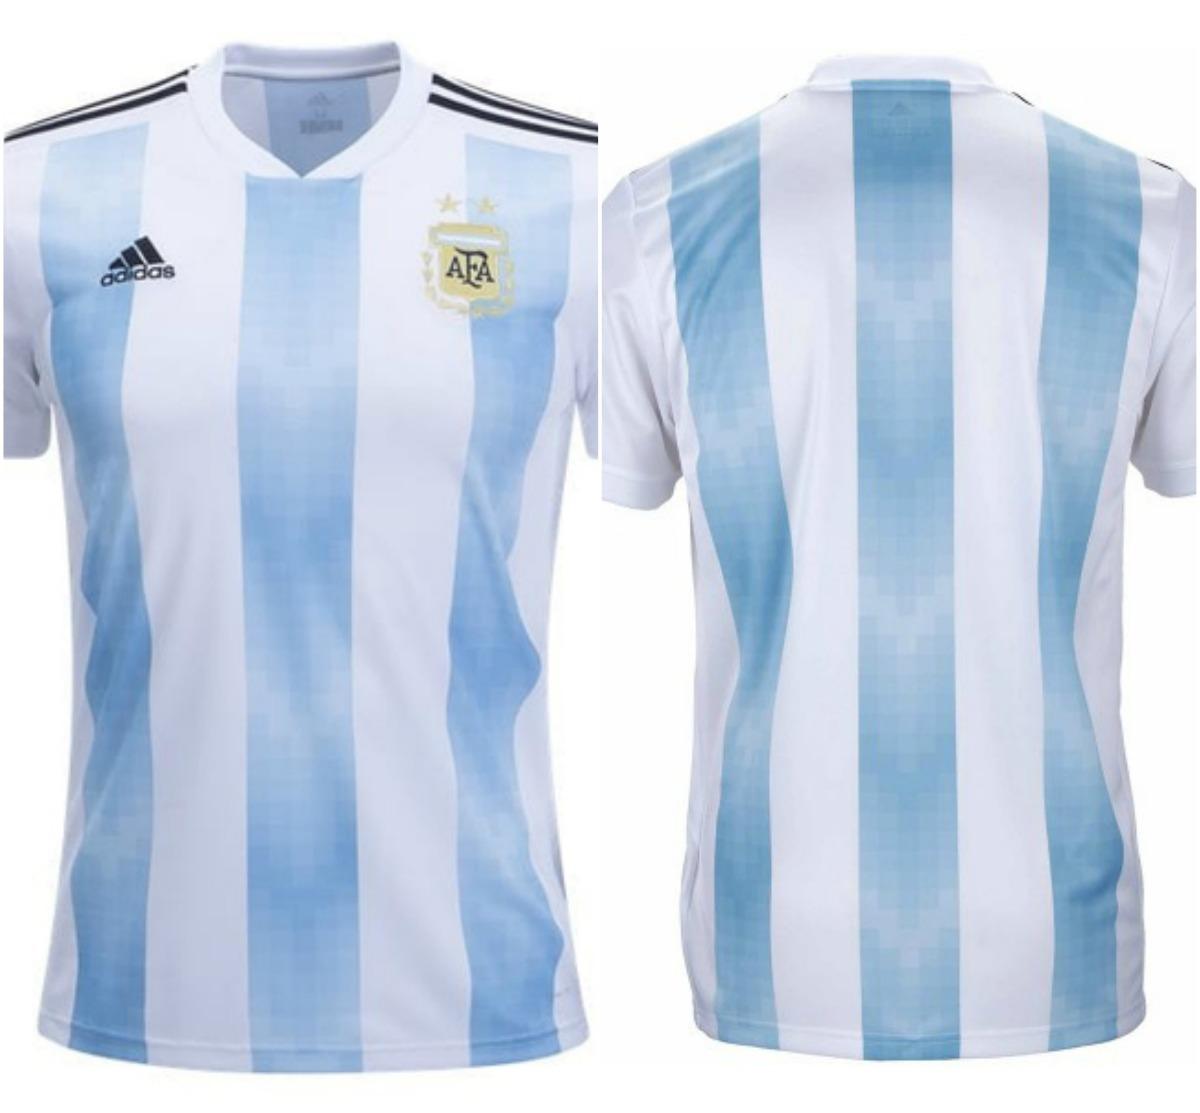 9eba2fc49c camiseta argentina oficial rusia 2018 adidas climalite. Cargando zoom.